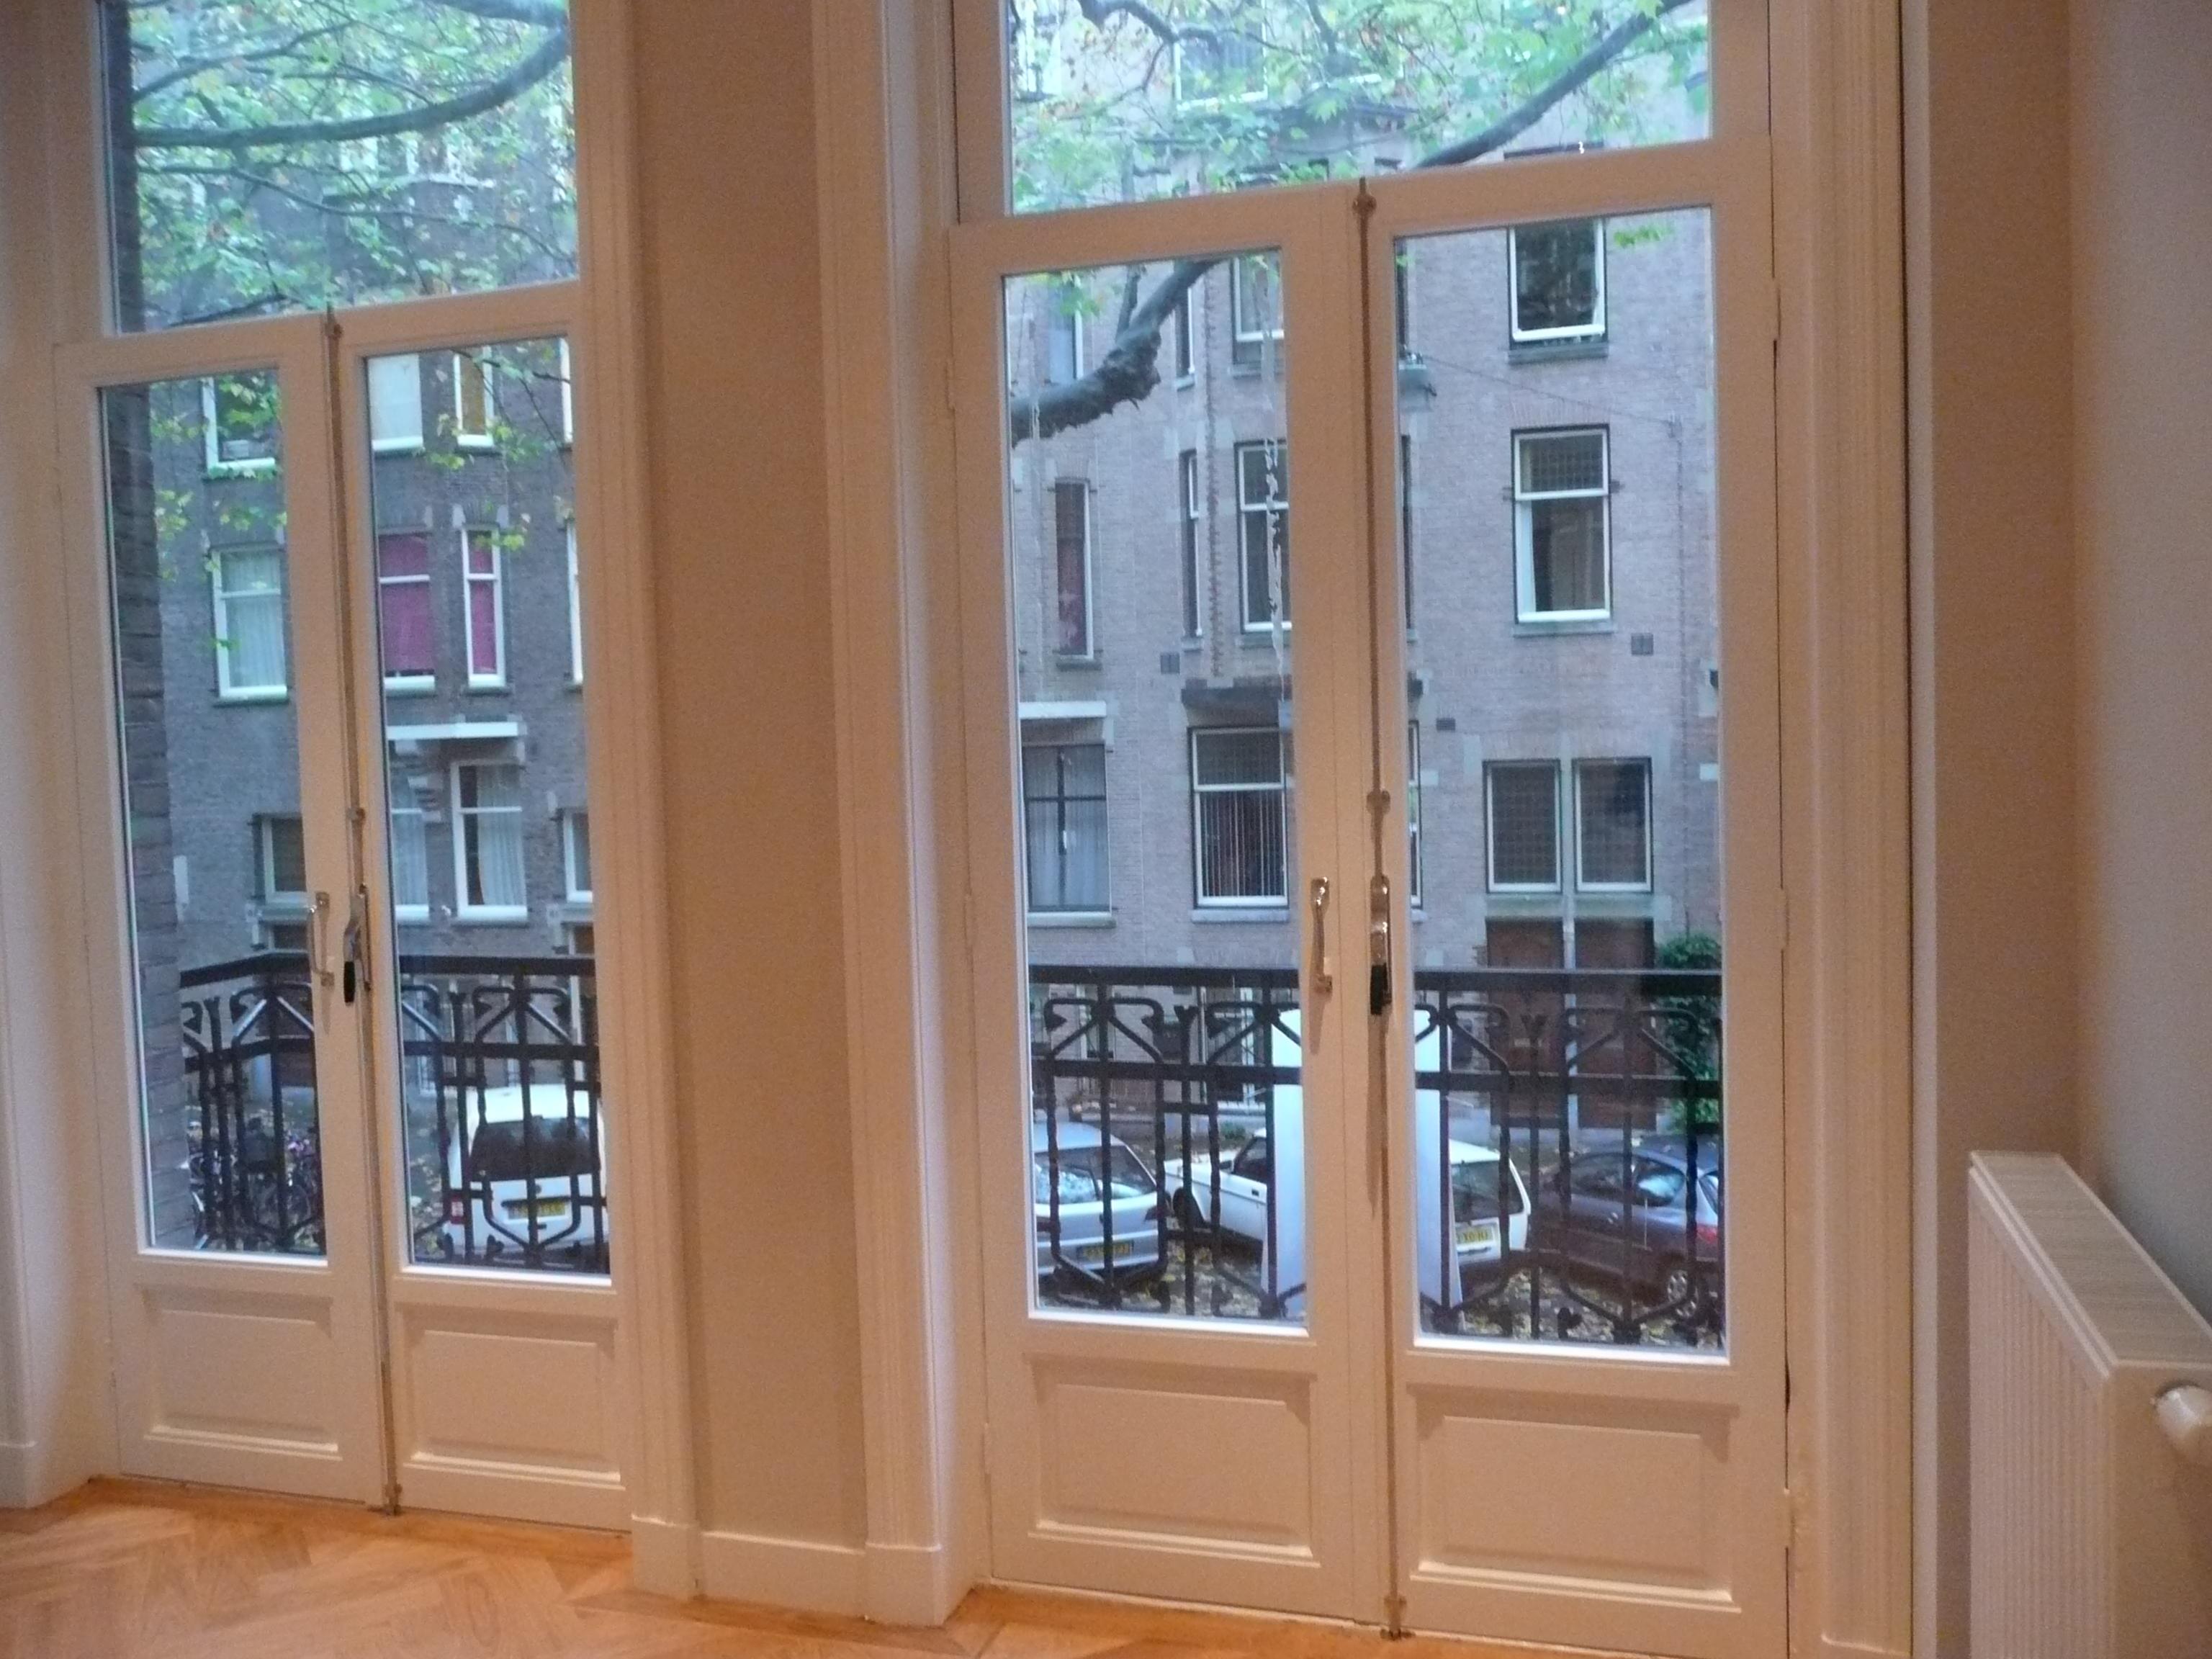 Guest Bedroom French Doors to Balcony